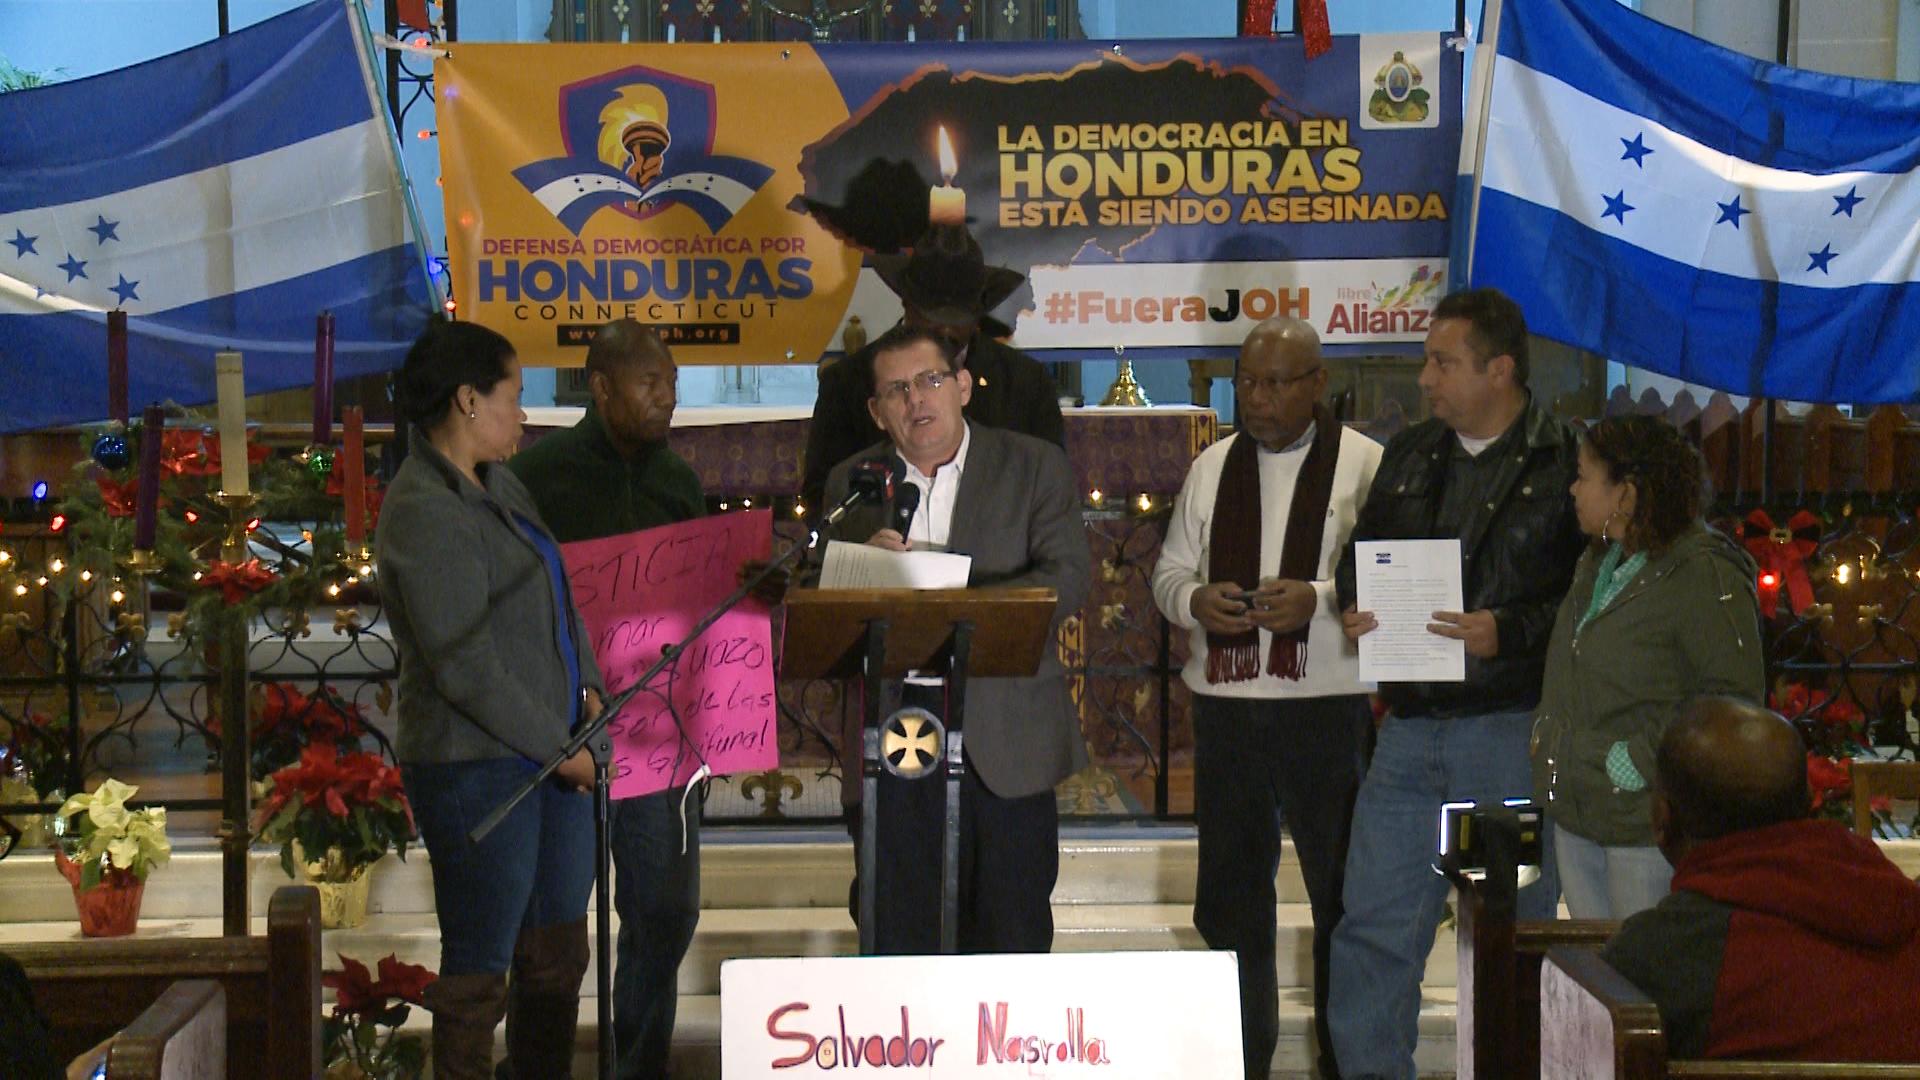 Honduras event